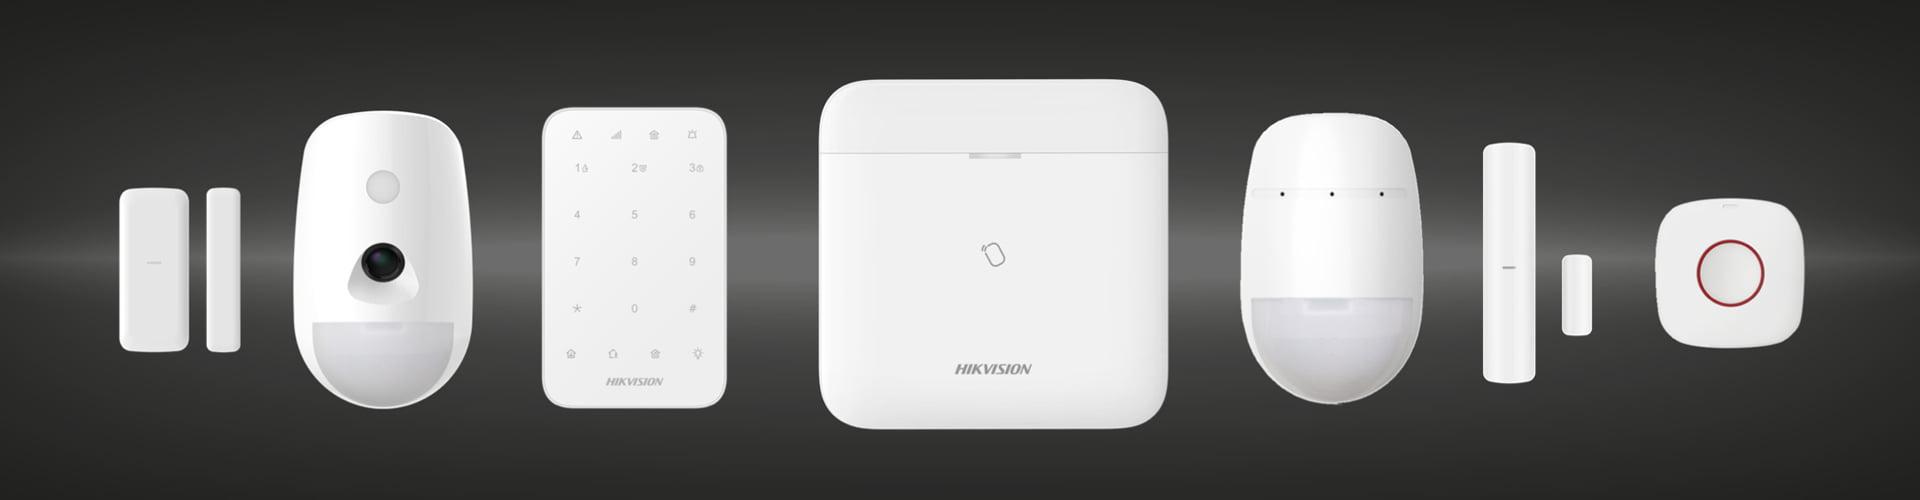 Hikvision-Ax-Pro-draadloos-alarmsysteem